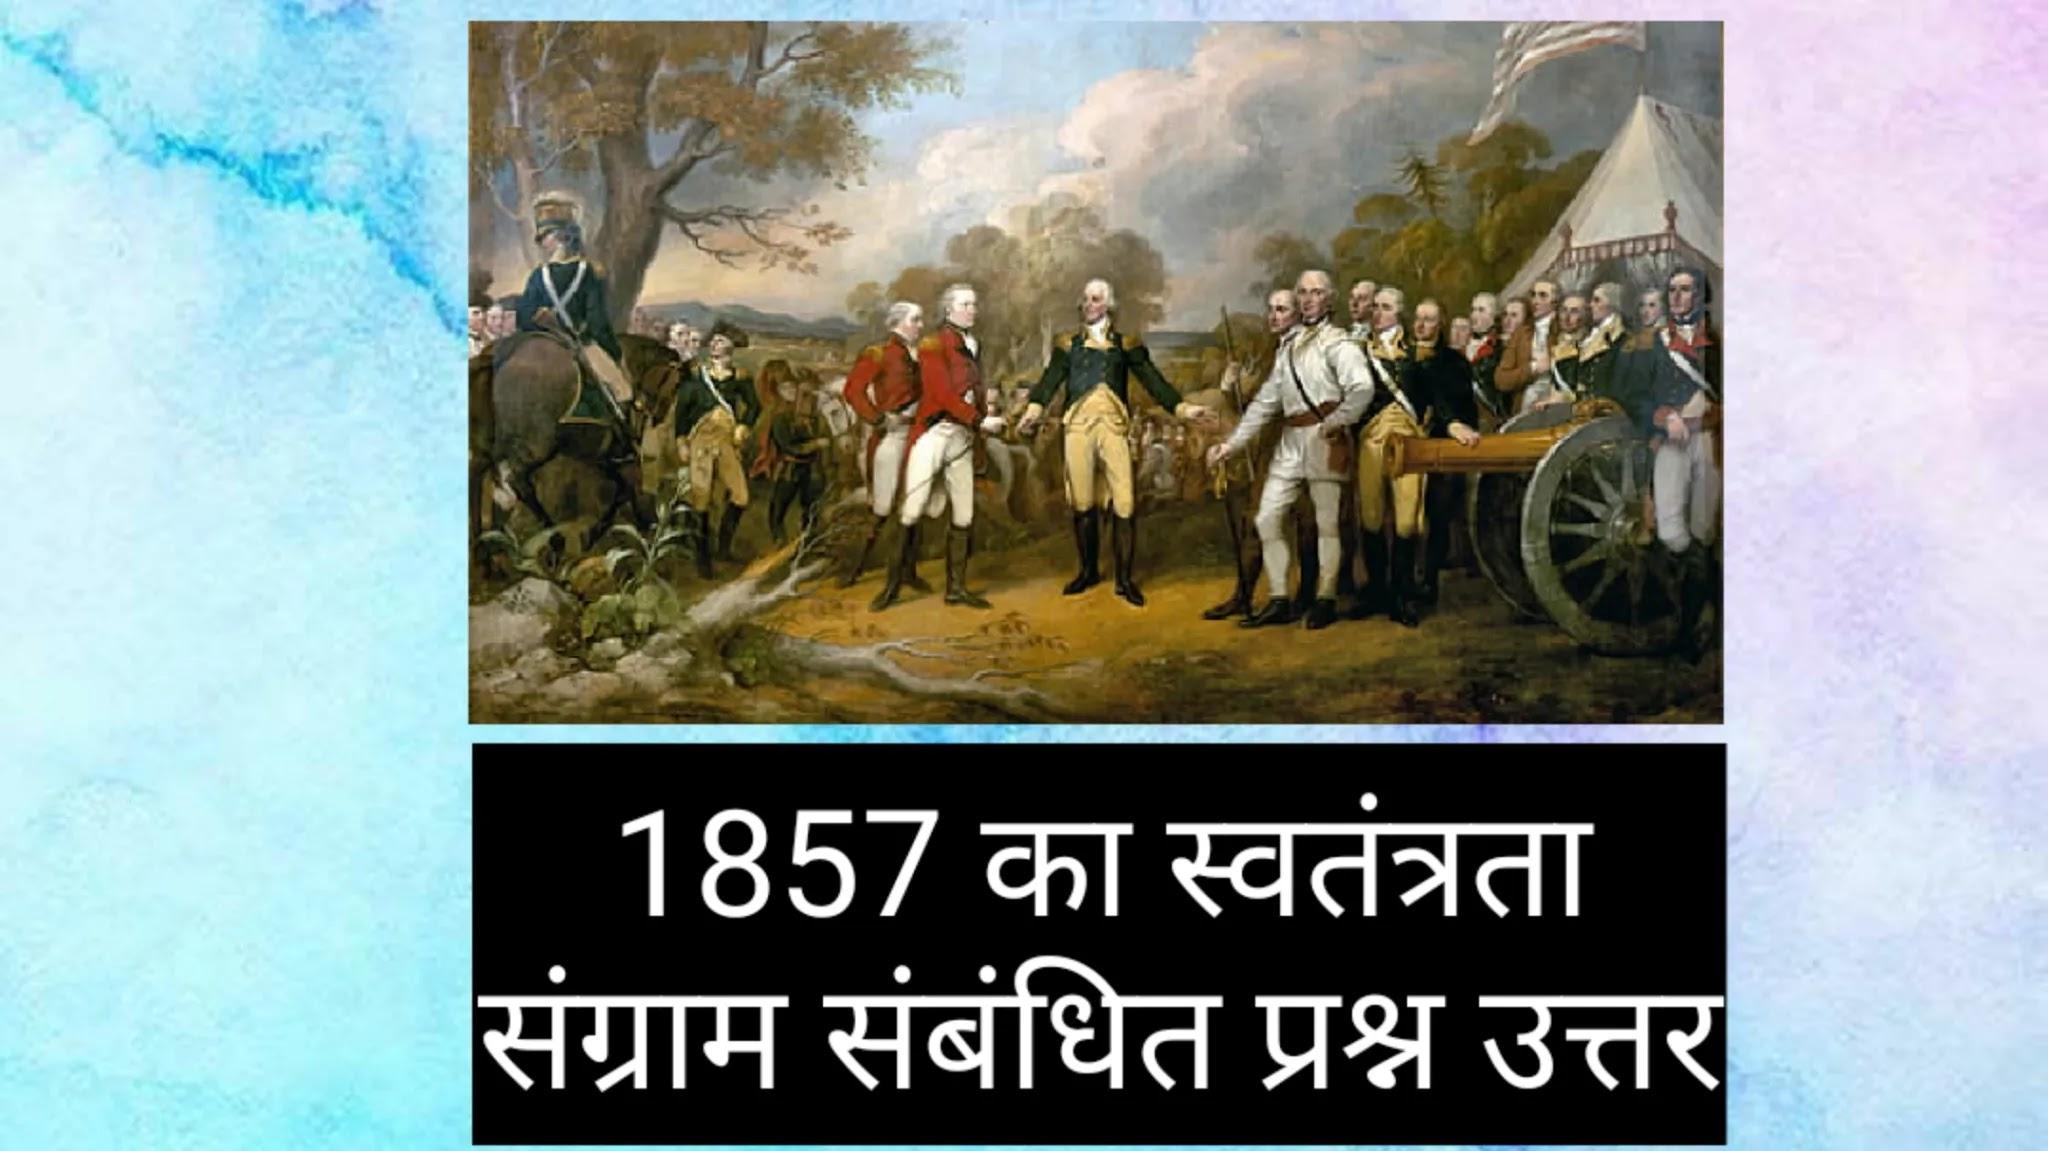 1857 का स्वतंत्रता संग्राम संबंधित प्रश्न उत्तर, 1857 का स्वतंत्रता संग्राम प्रश्नोत्तरी, 1857 के स्वतंत्रता संग्राम से संबंधित जानकारी, 1857 Freedom Struggle Related Question Answer